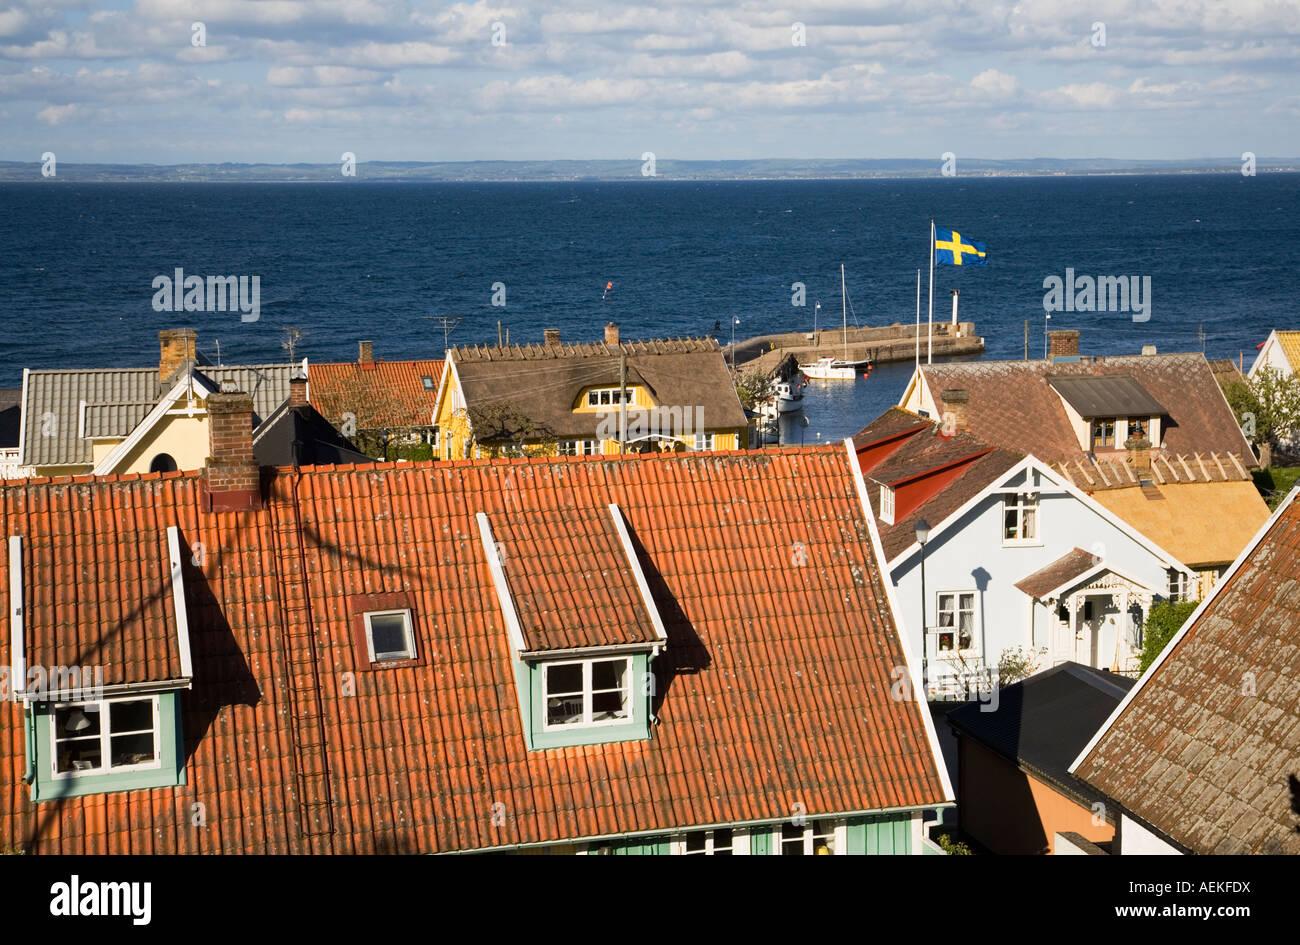 Sweden Skåne Scania Kullen Viken summer 2007 - Stock Image